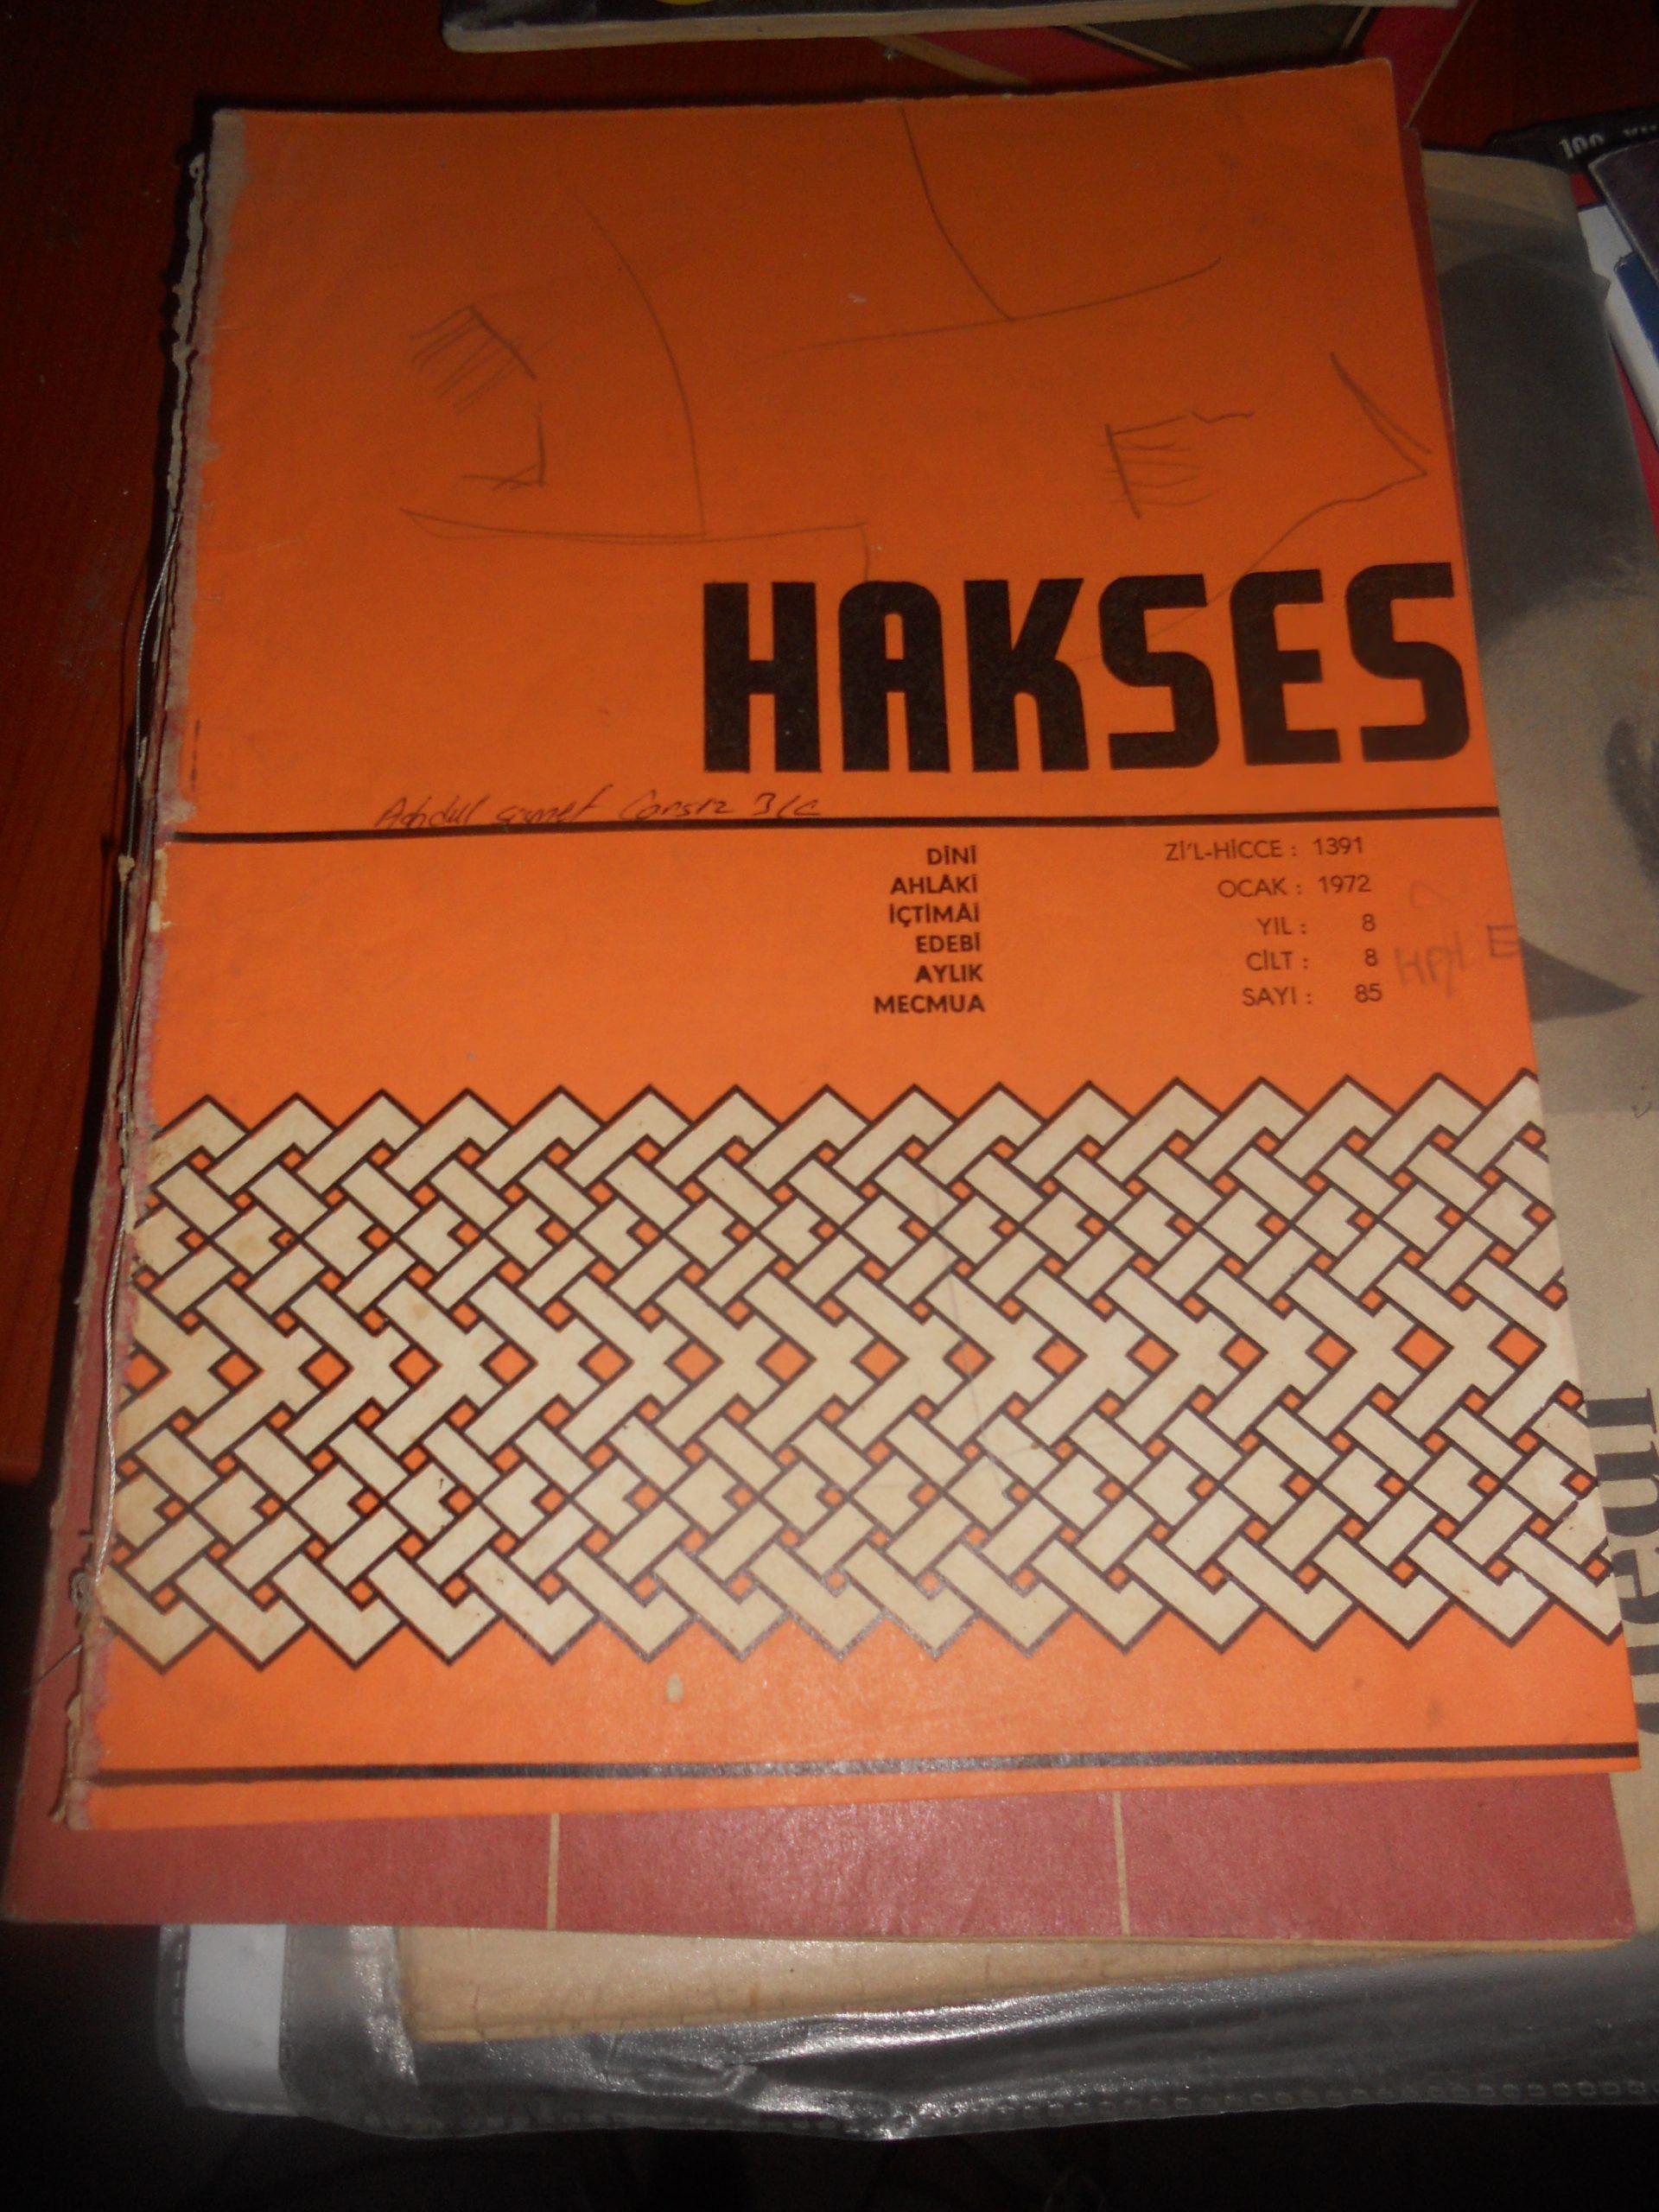 HAKSES DERGİSİ/ 2 adet+Din Öğretimi derg 1 adet/ toplam.15 tl